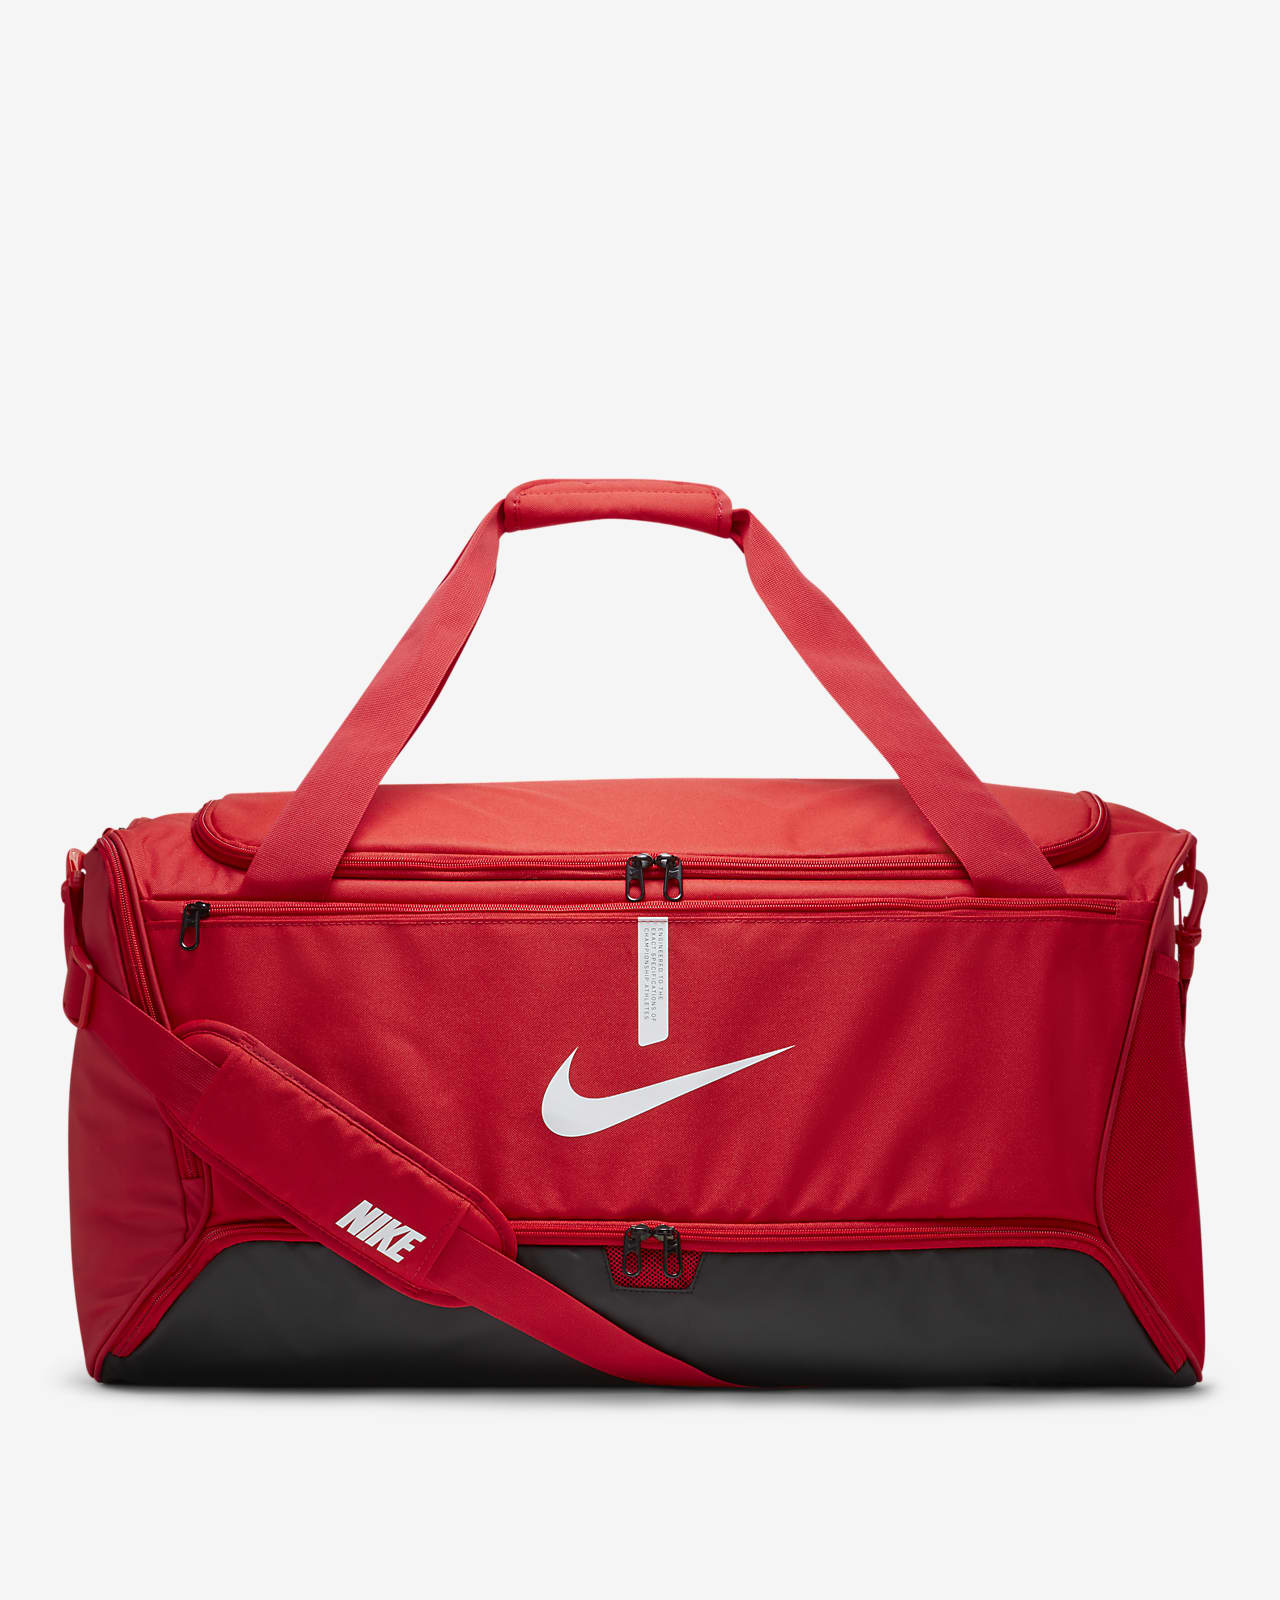 Nike Academy Team Football Duffel Bag (Large)